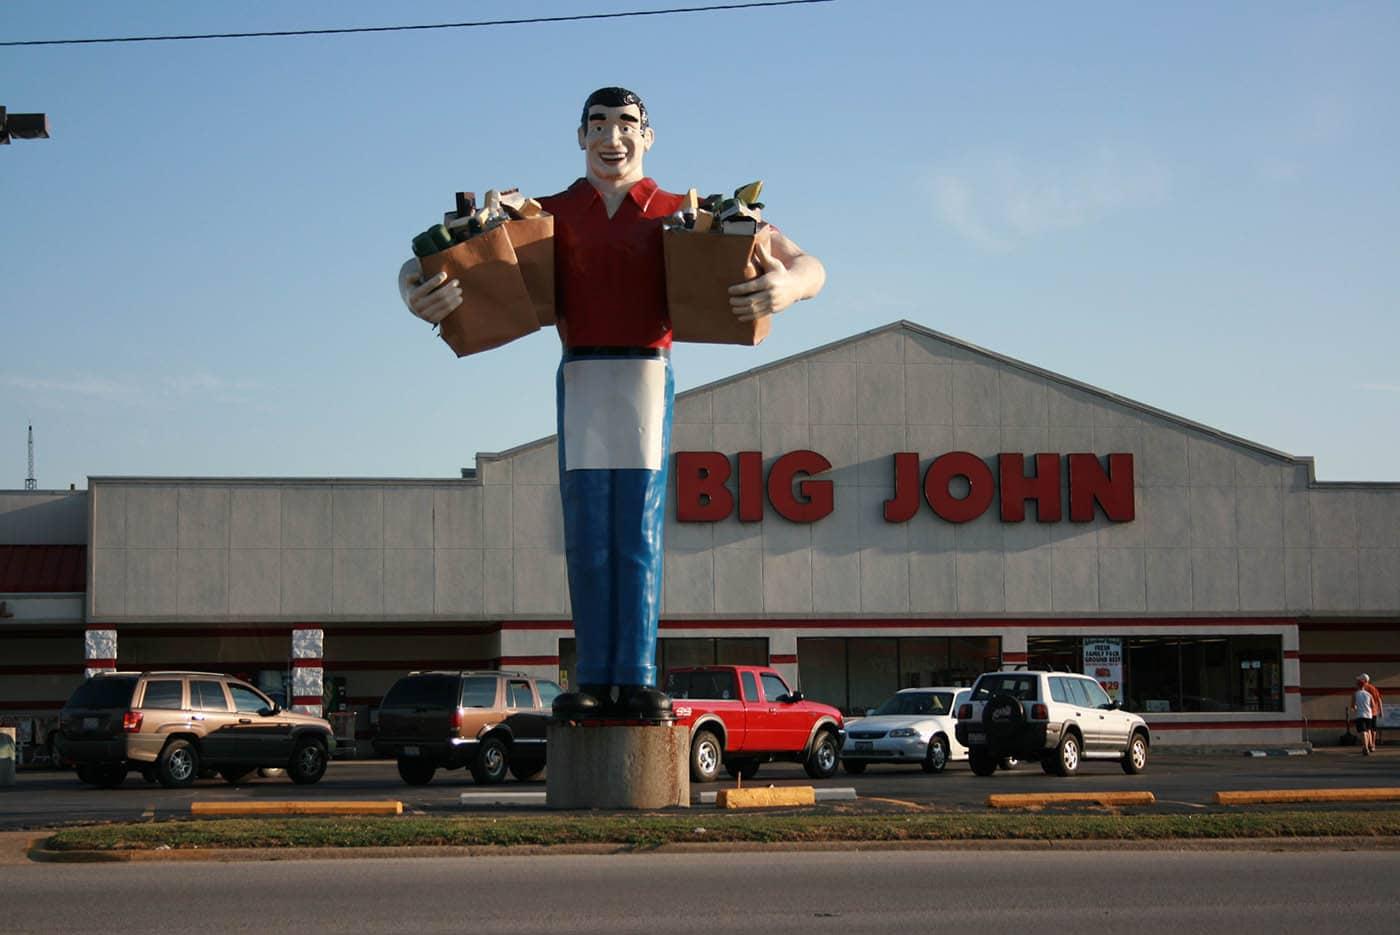 ILLINOIS ROAD TRIP AND ROADSIDE ATTRACTIONS: BIG JOHN, GROCERY CLERK IN METROPOLIS